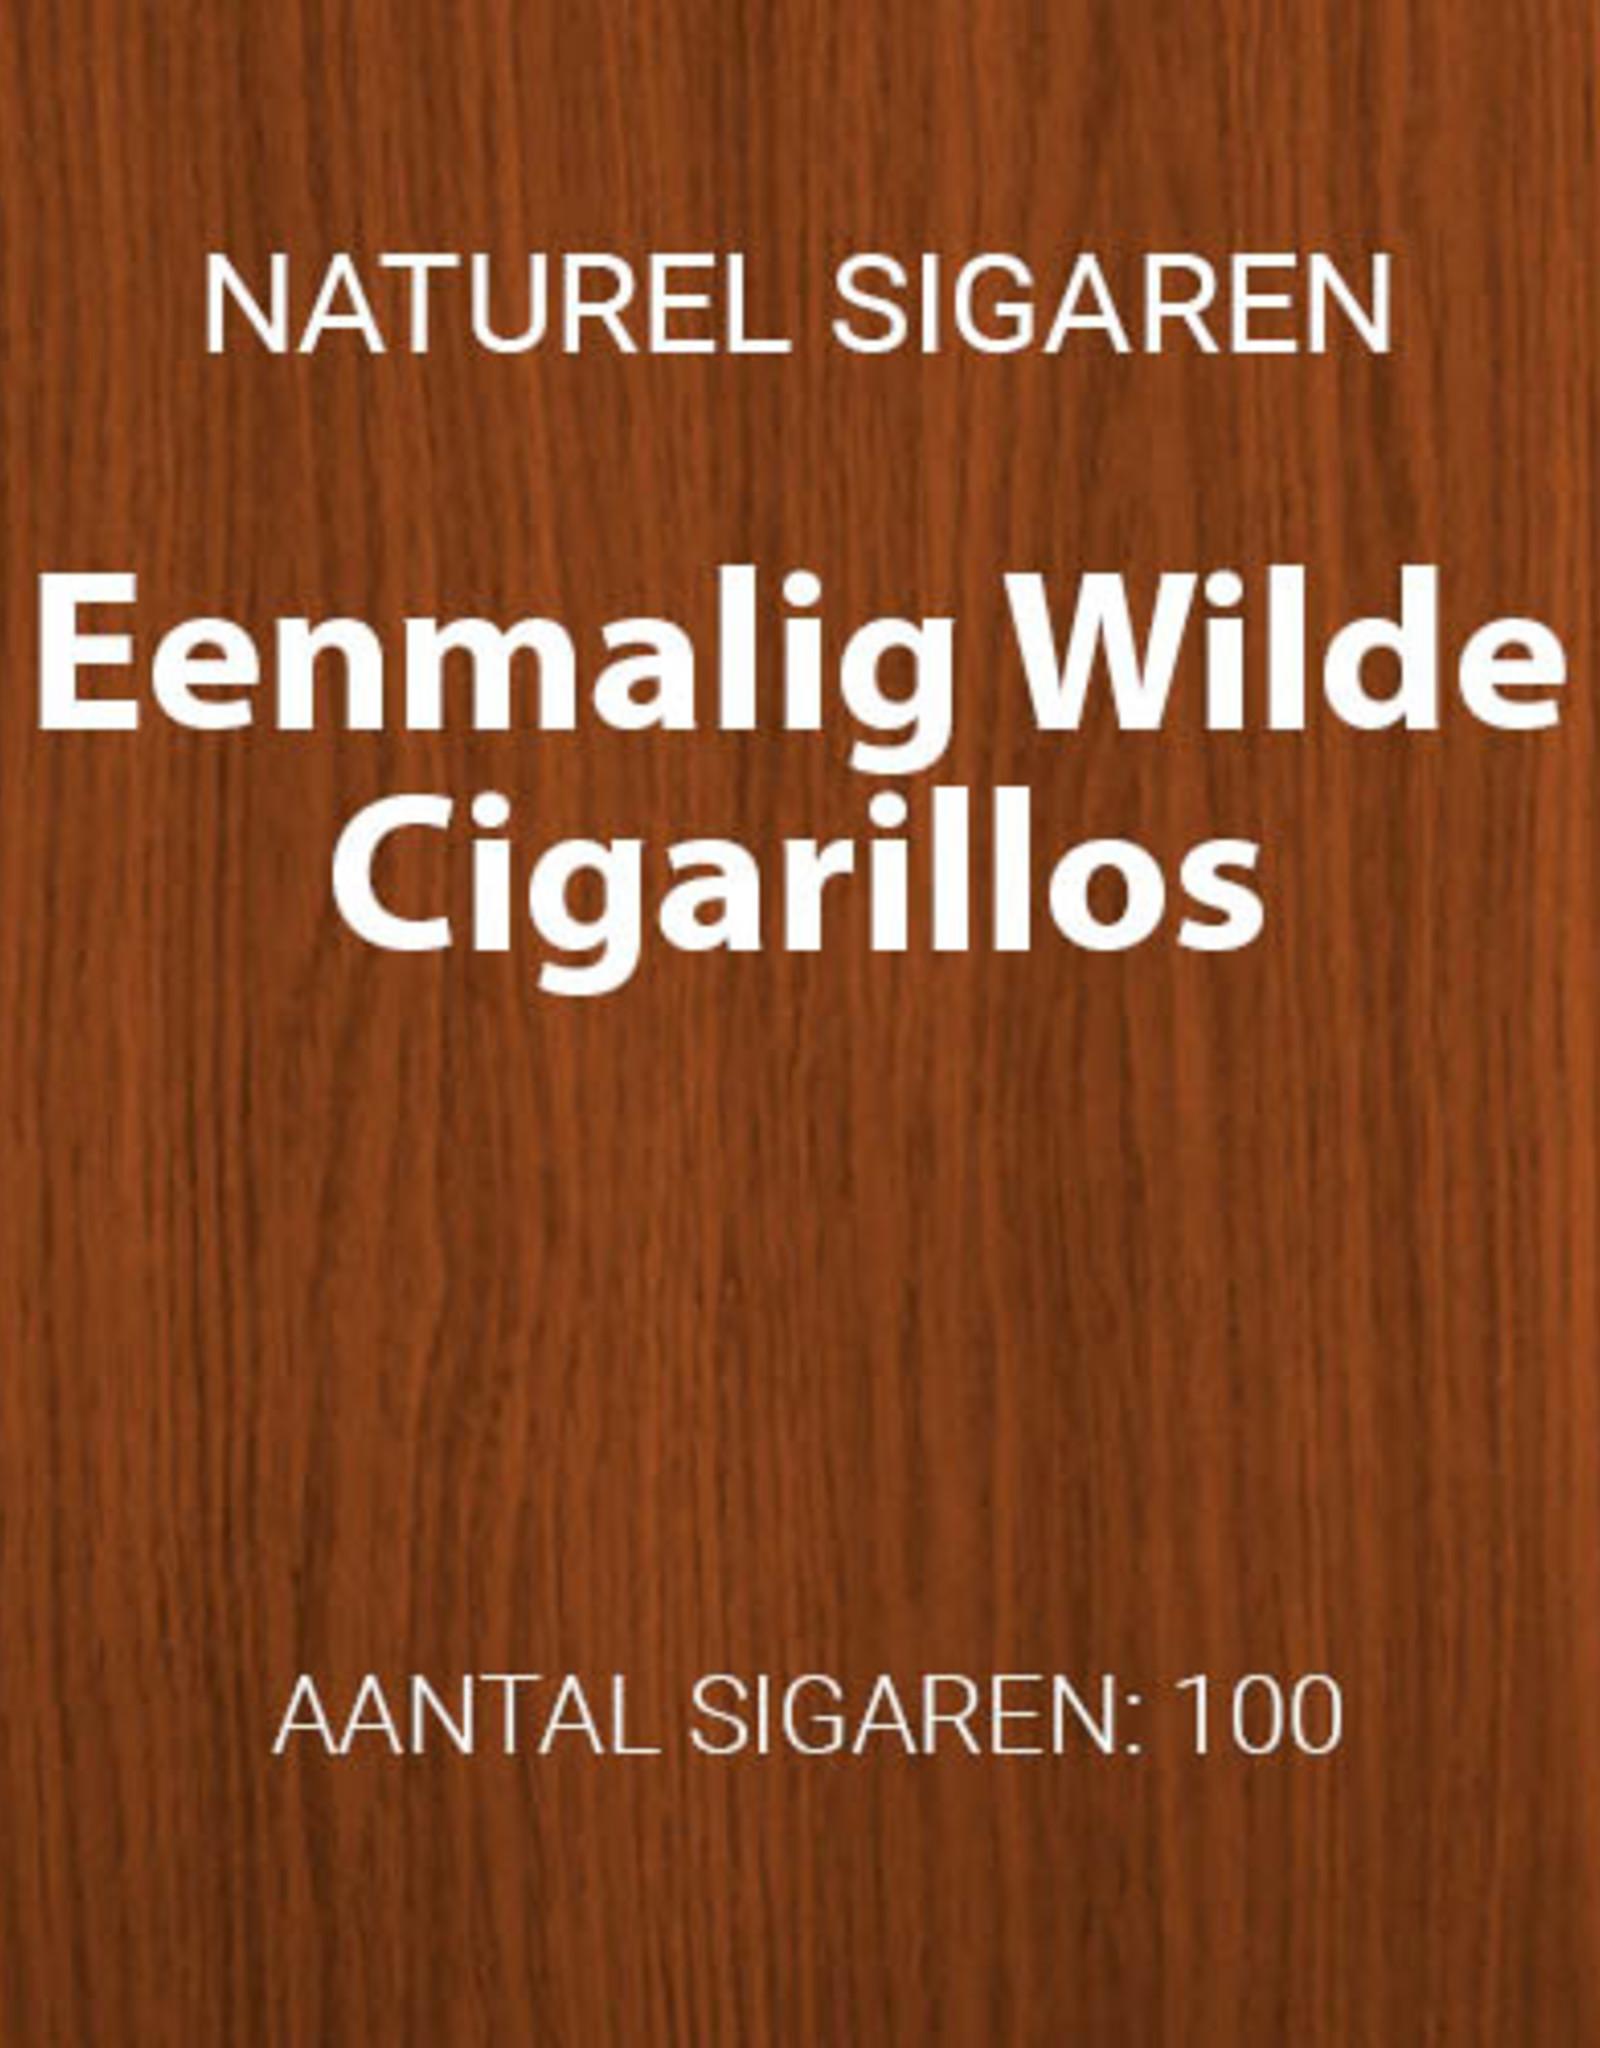 Eenmalig Eenmalig Wilde Cigarillos (100x)